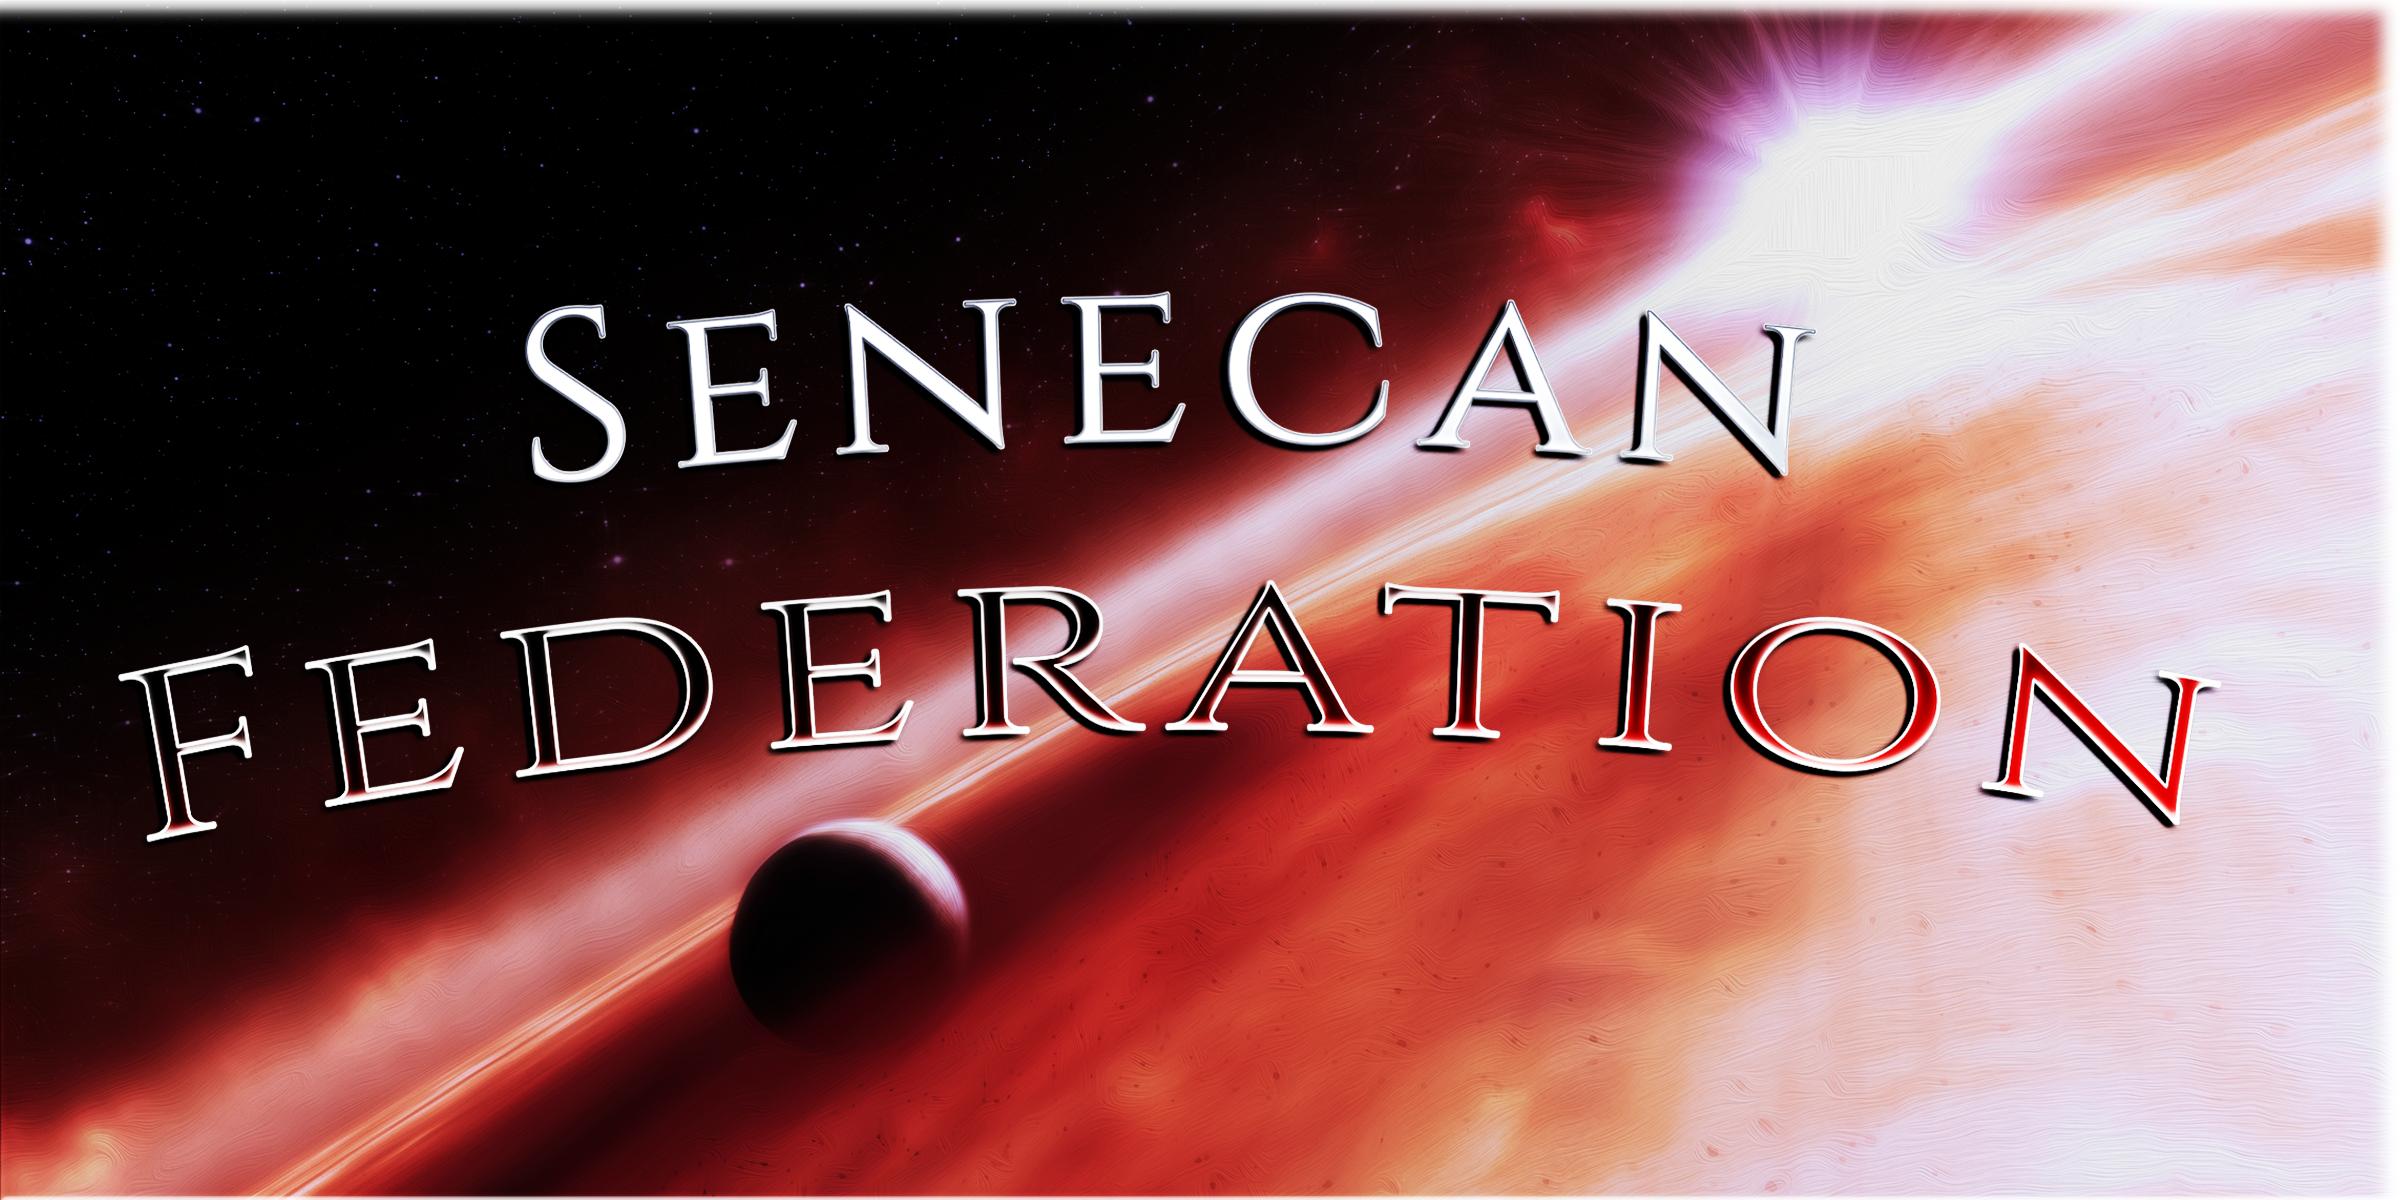 Senecan Federation Emblem